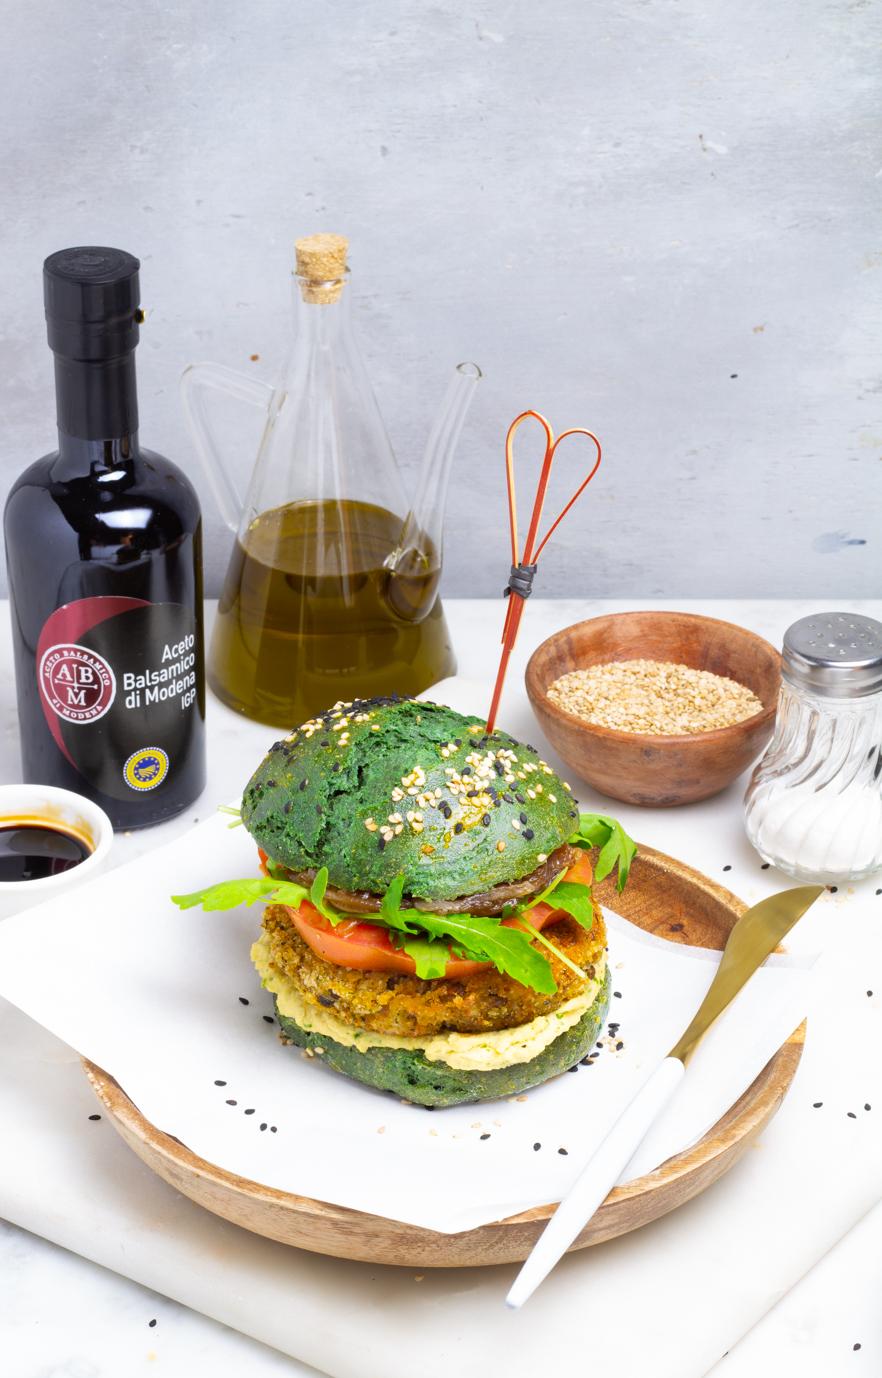 burger di lenticchie con pane alla spirulina